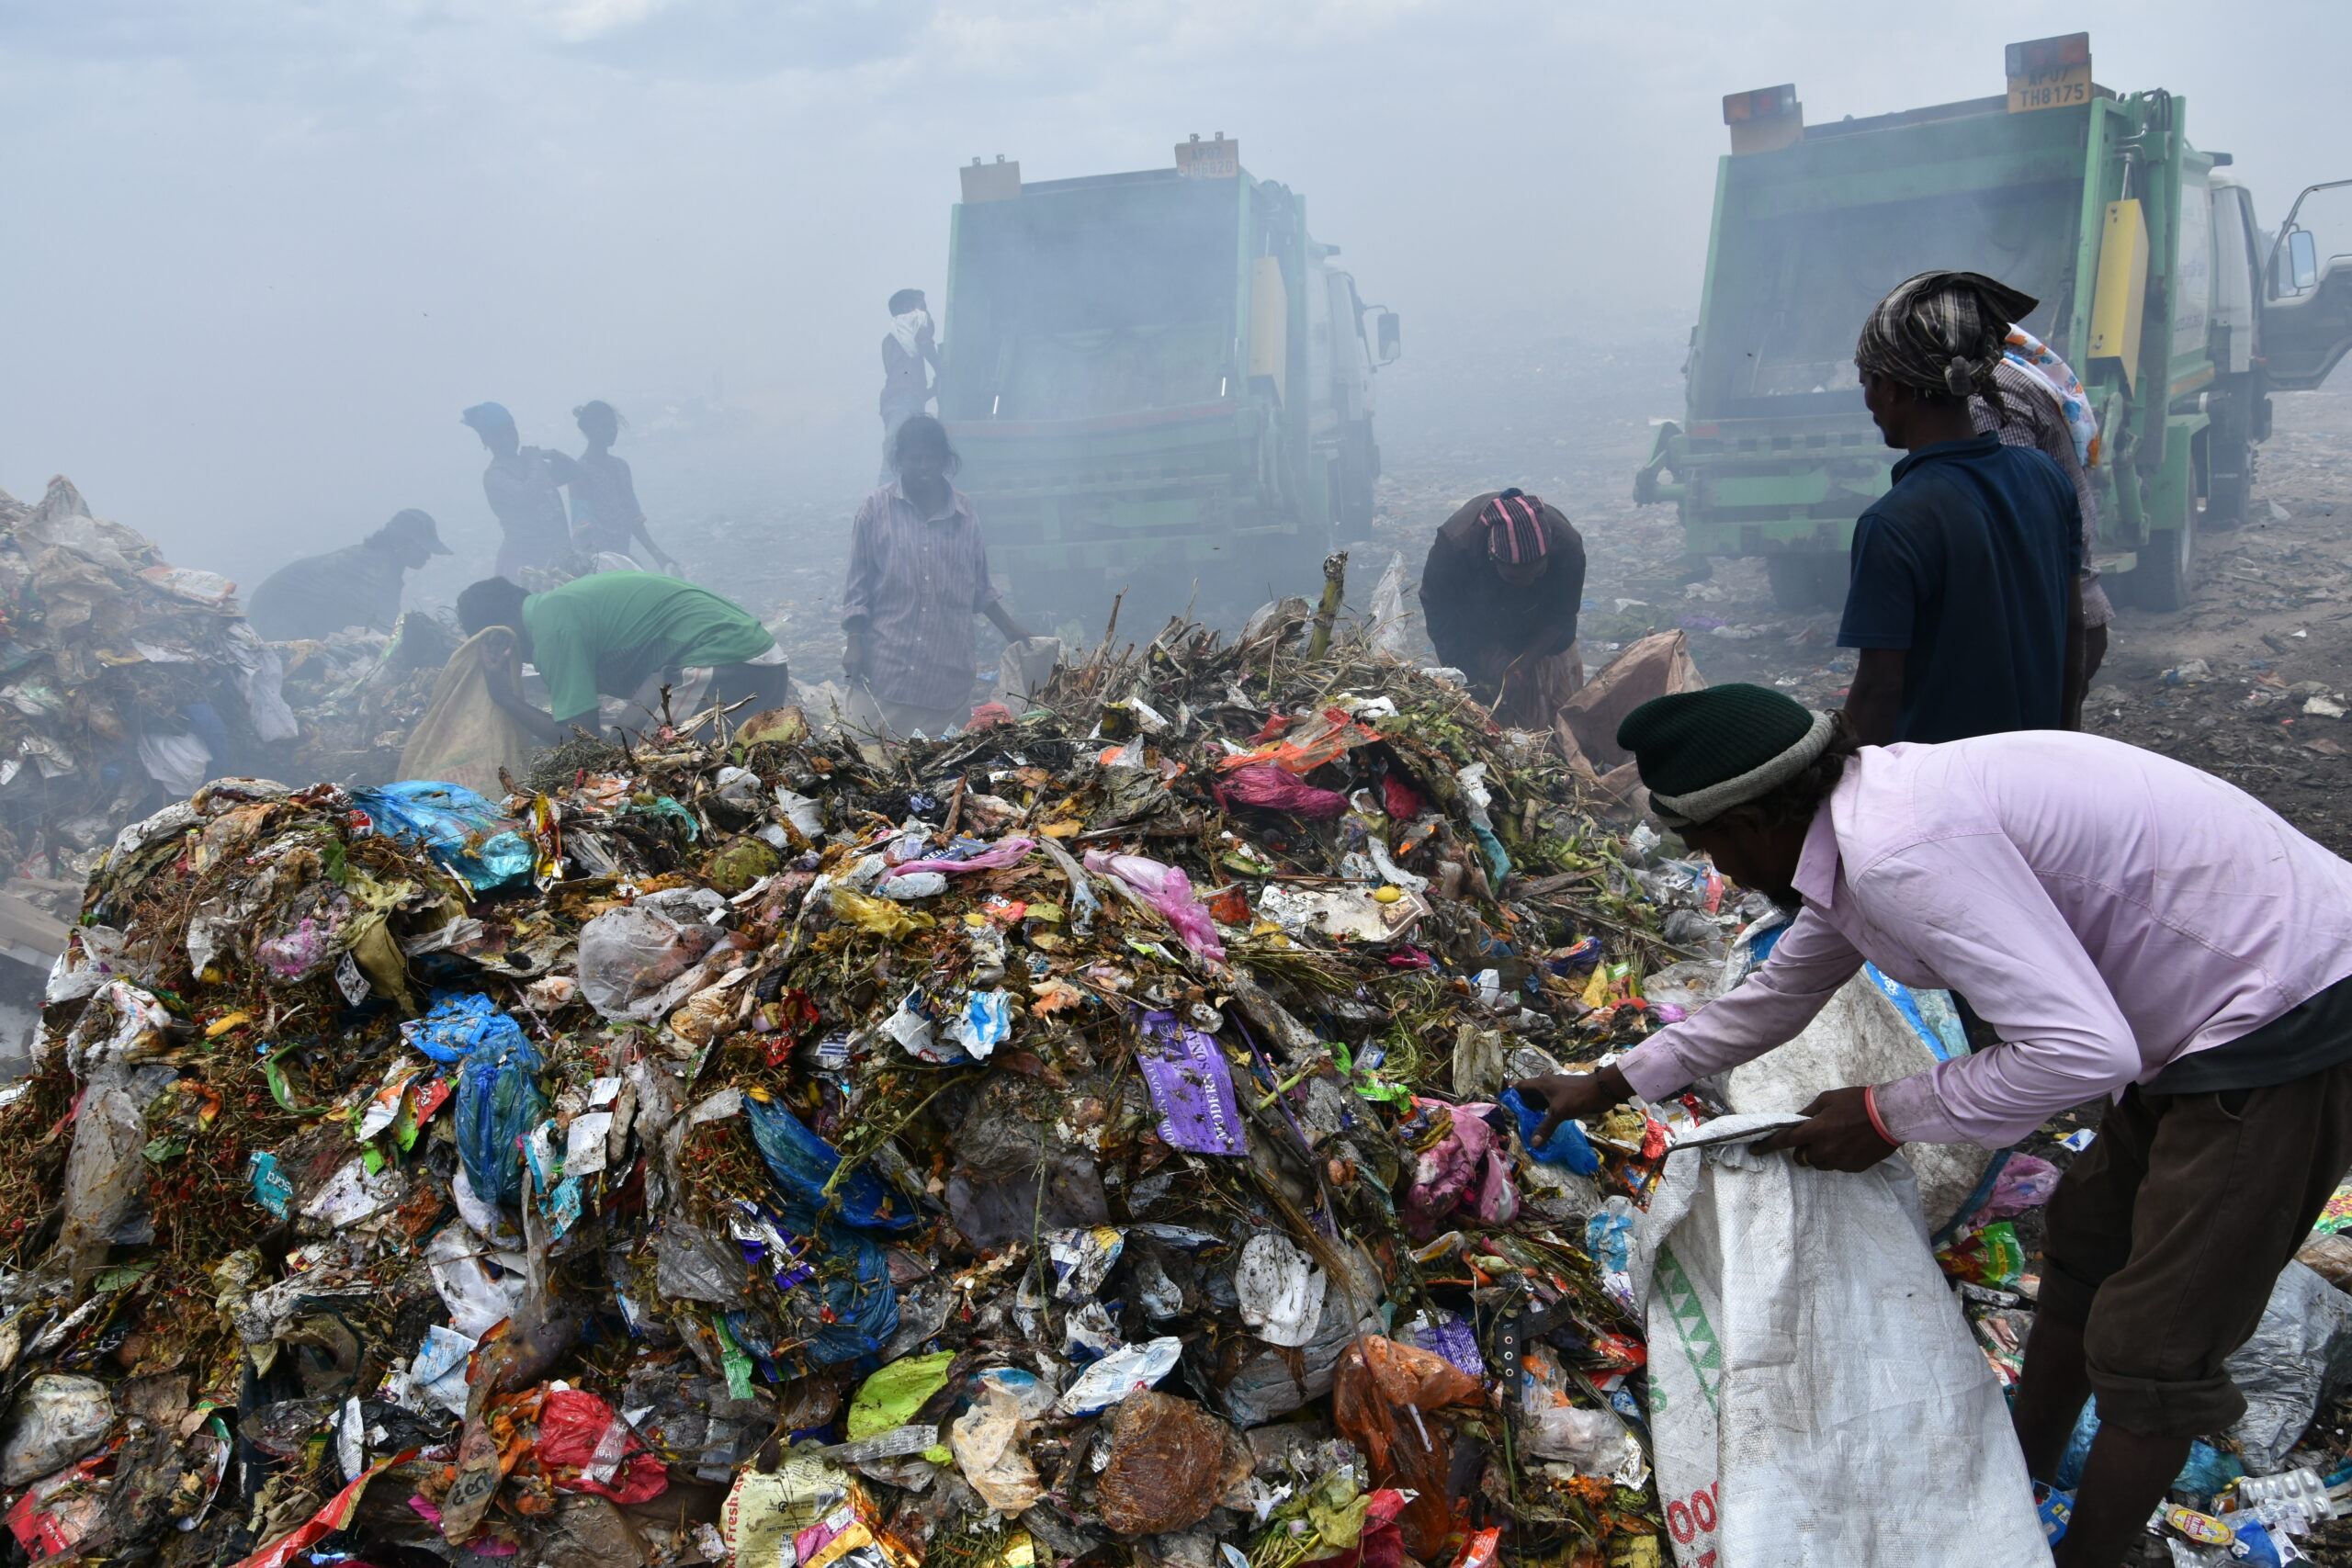 Piles of plastic on a dump site